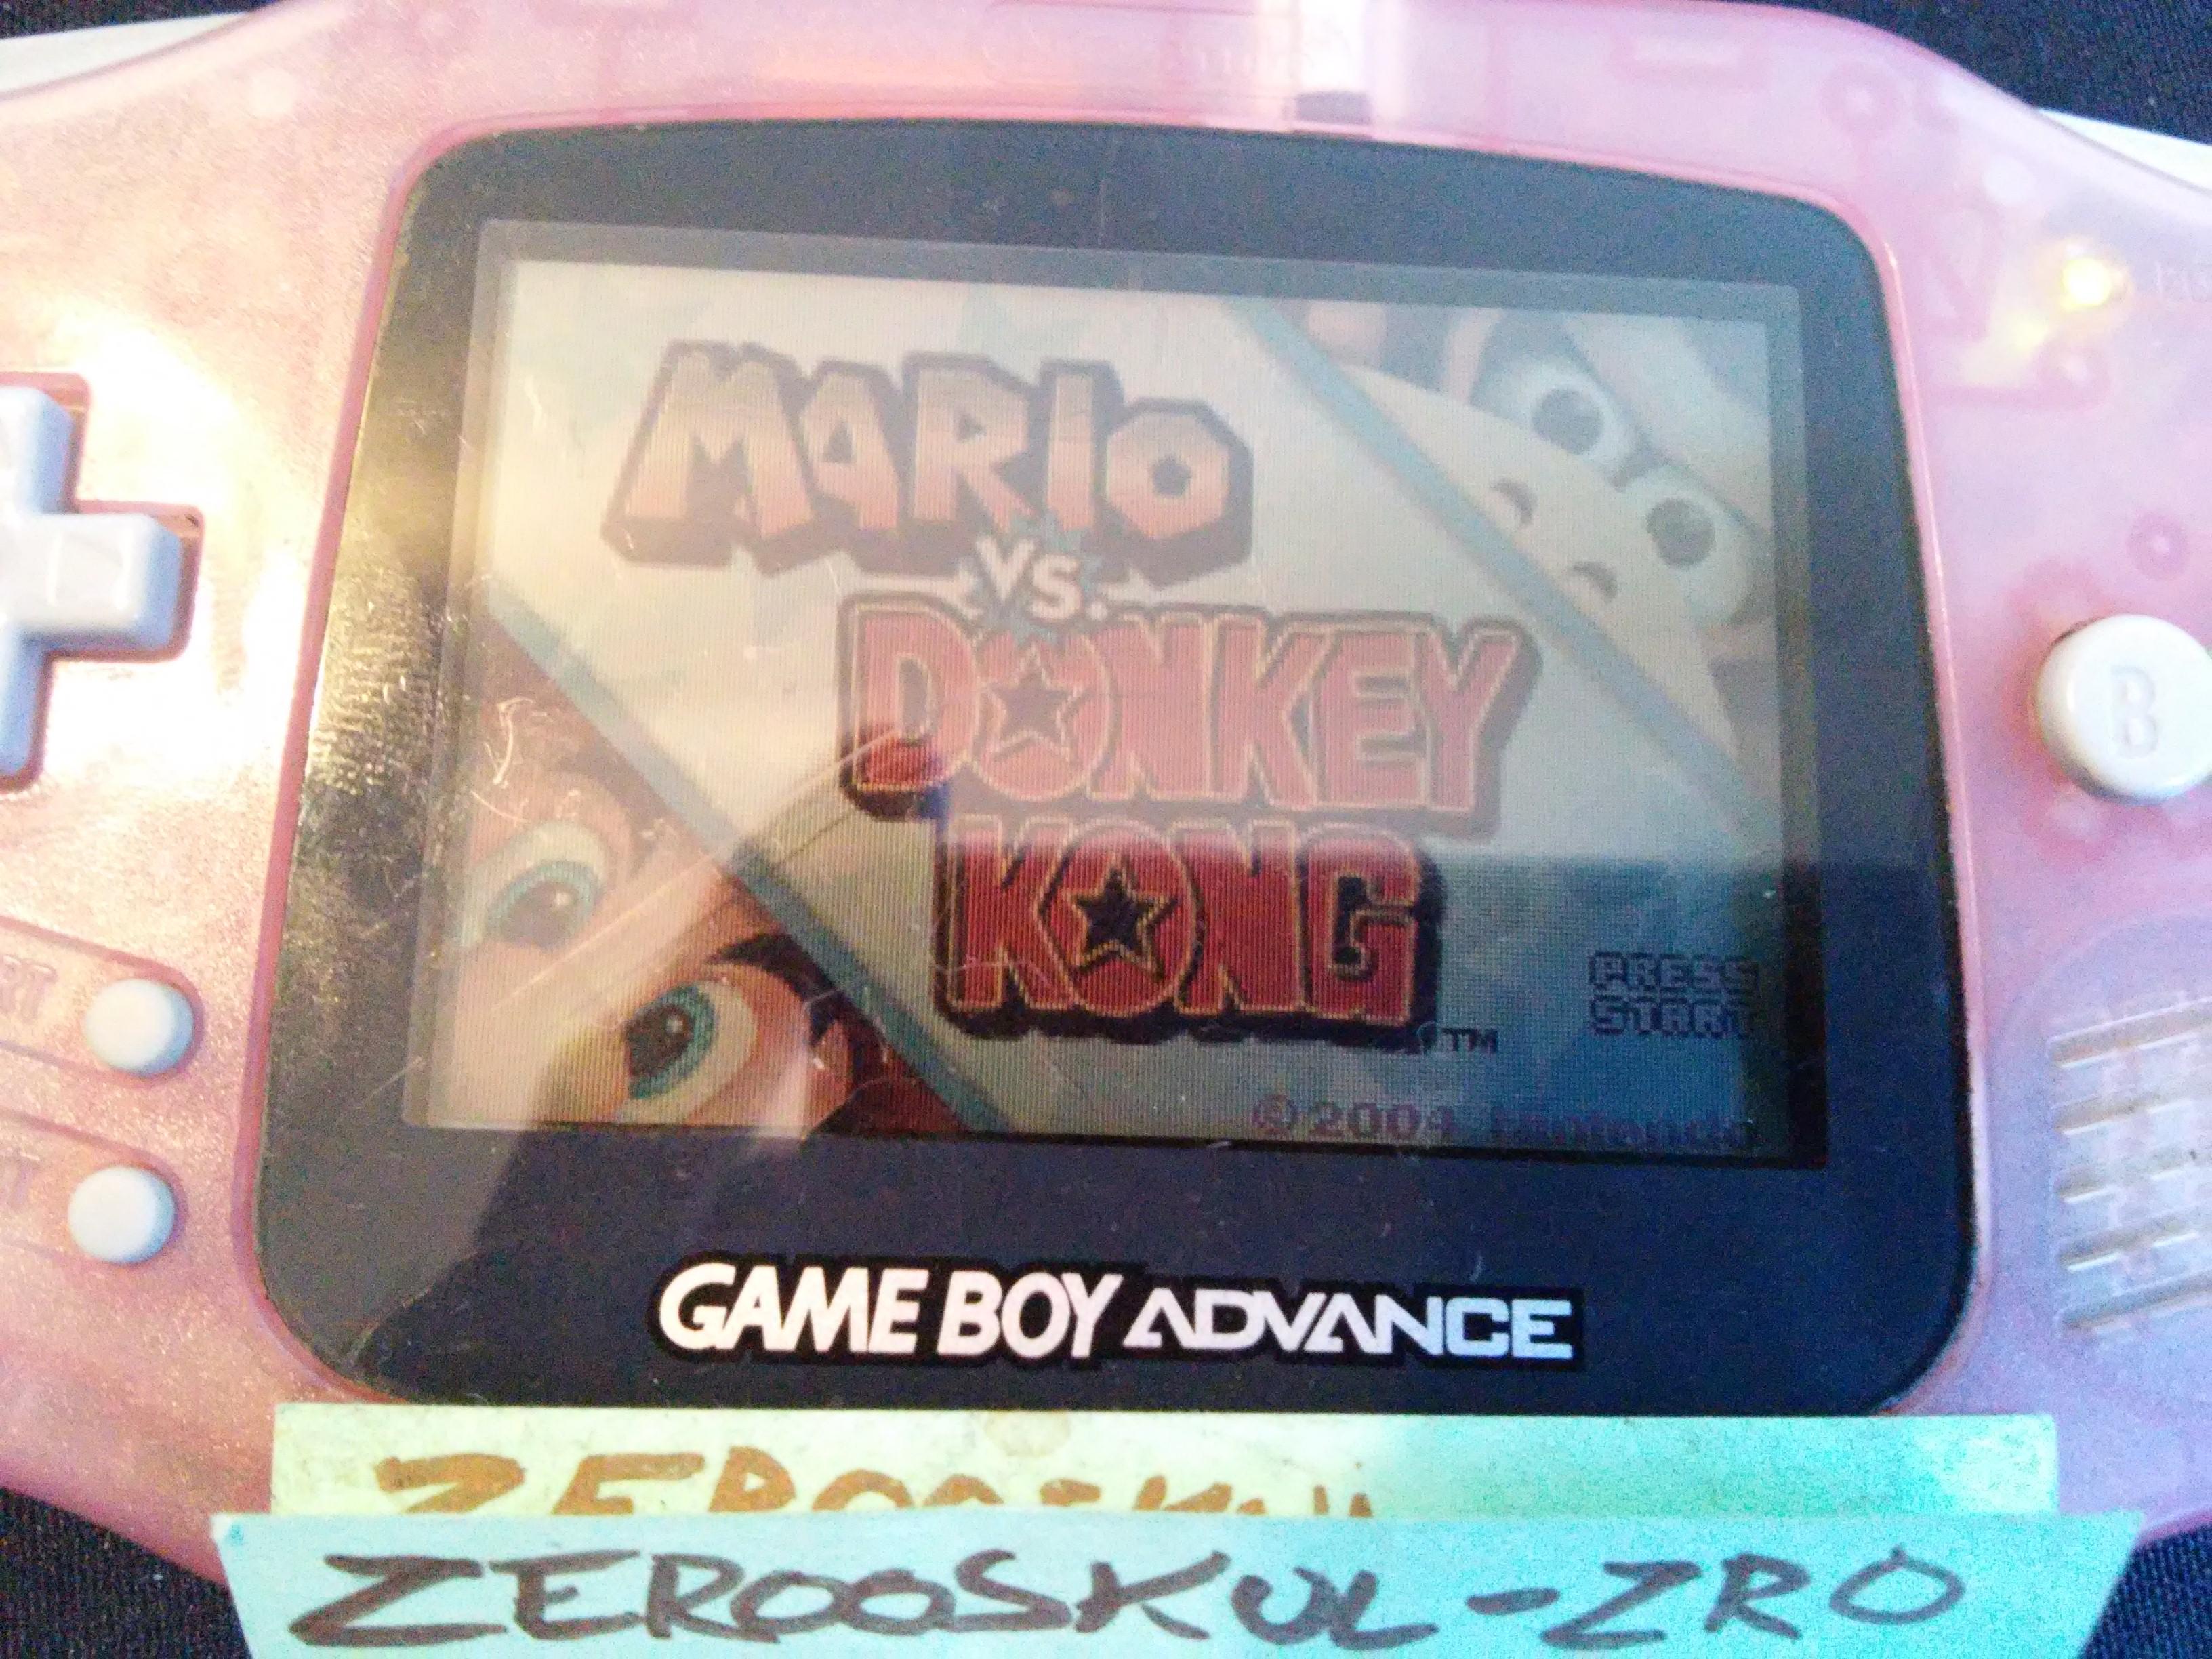 zerooskul: Mario Vs. Donkey Kong: Level 1-6 (GBA) 32,250 points on 2018-09-23 15:41:03